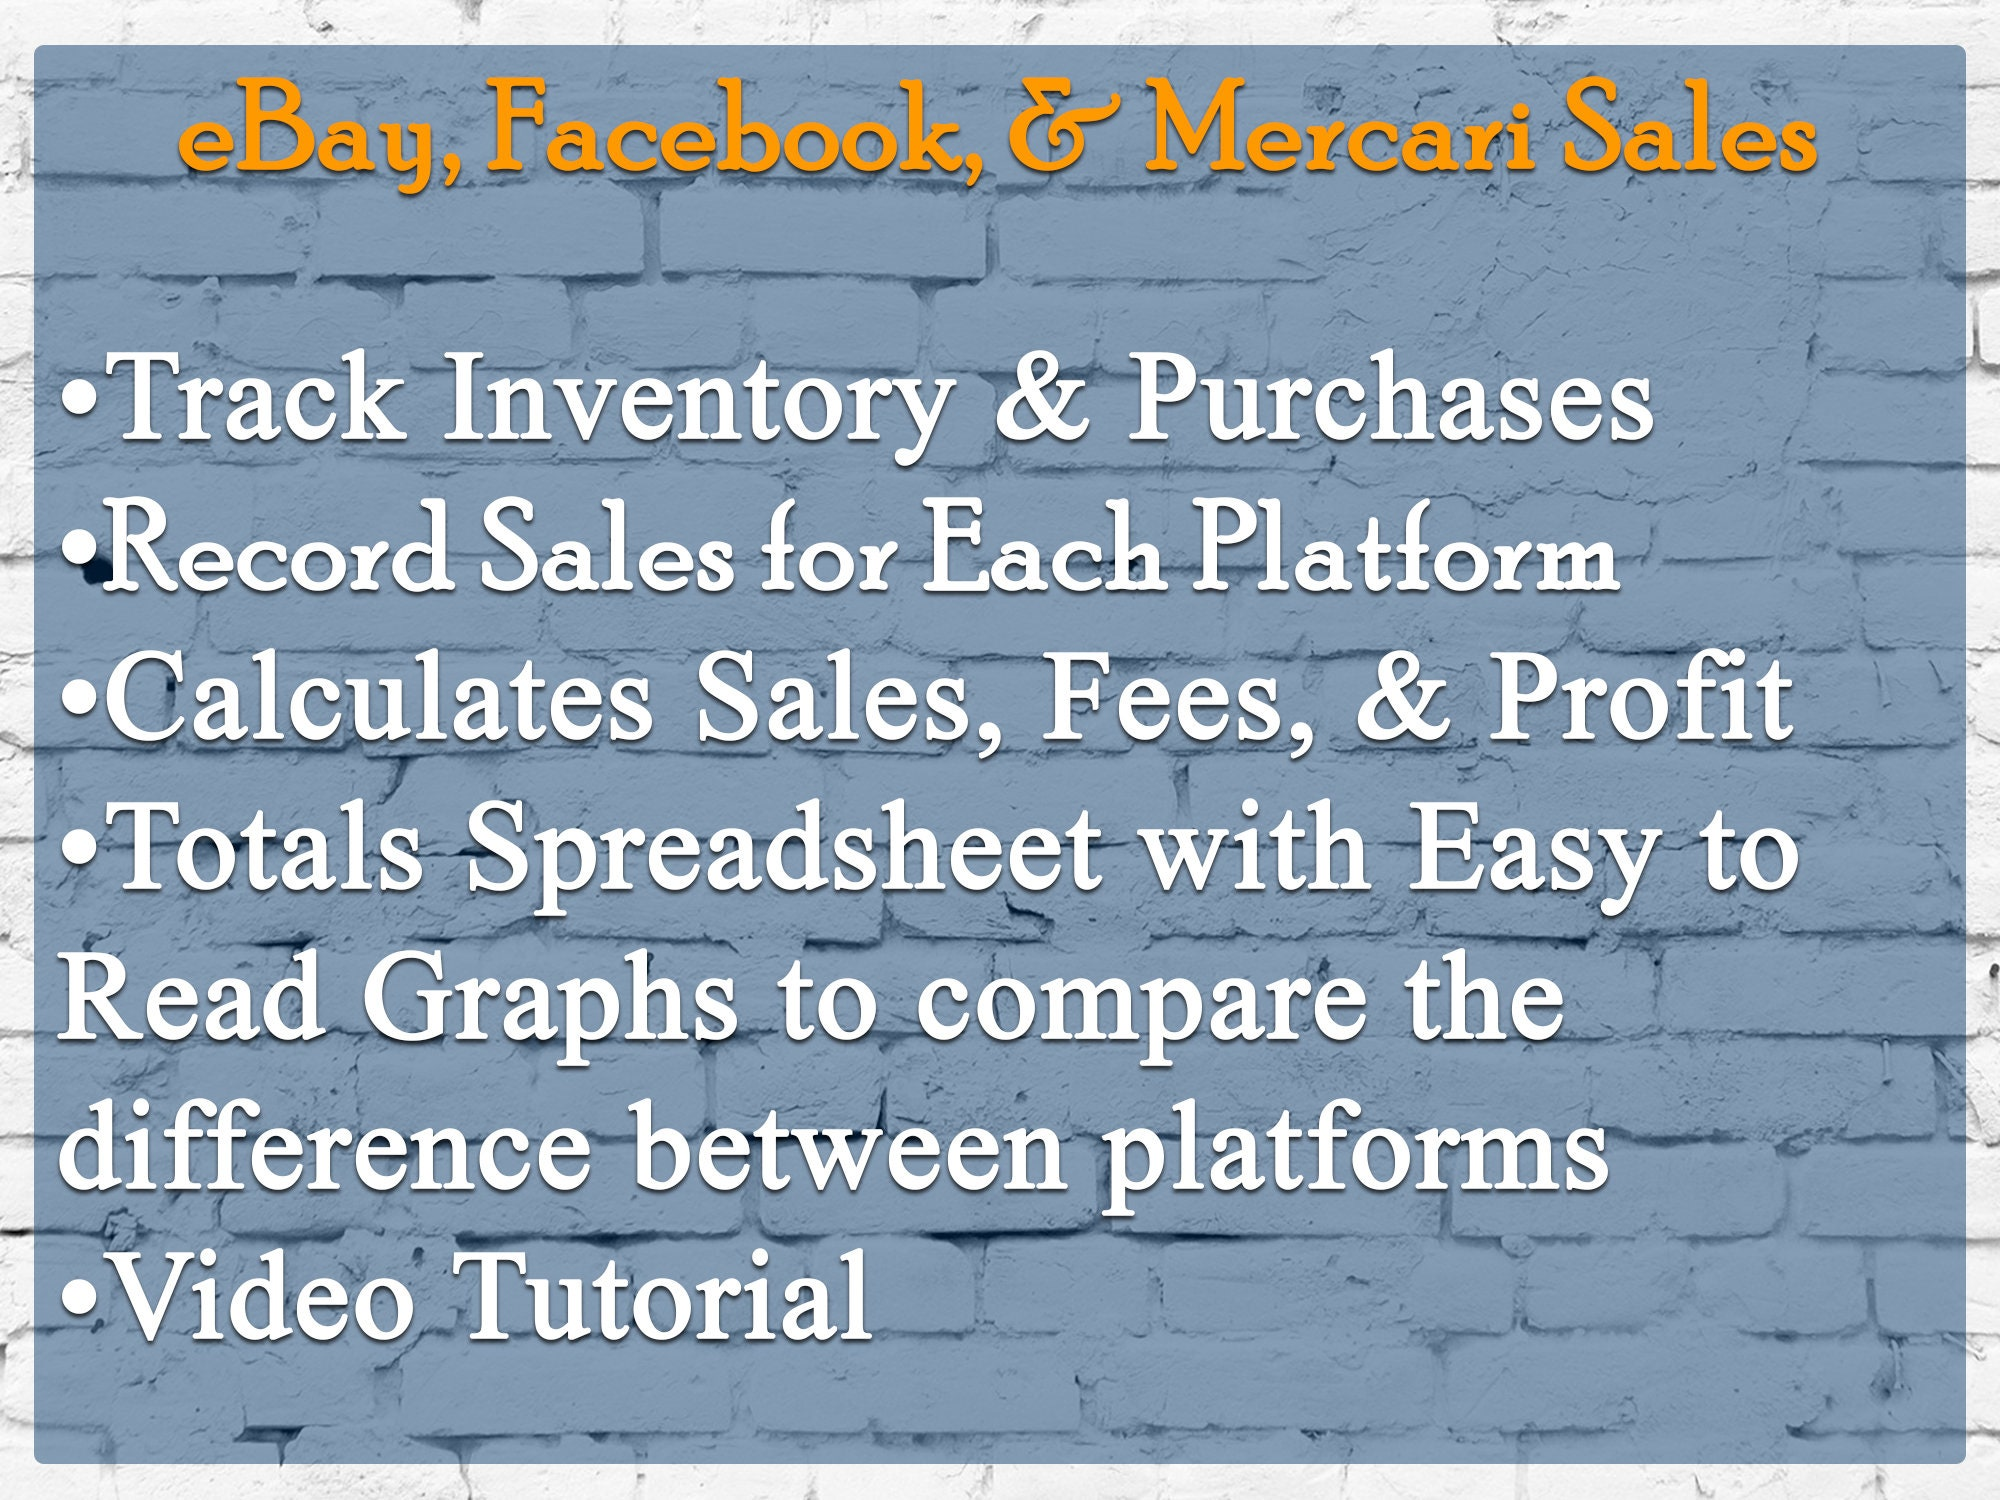 Ebay Mercari And Facebook Spreadsheet Template Sales Report Etsy